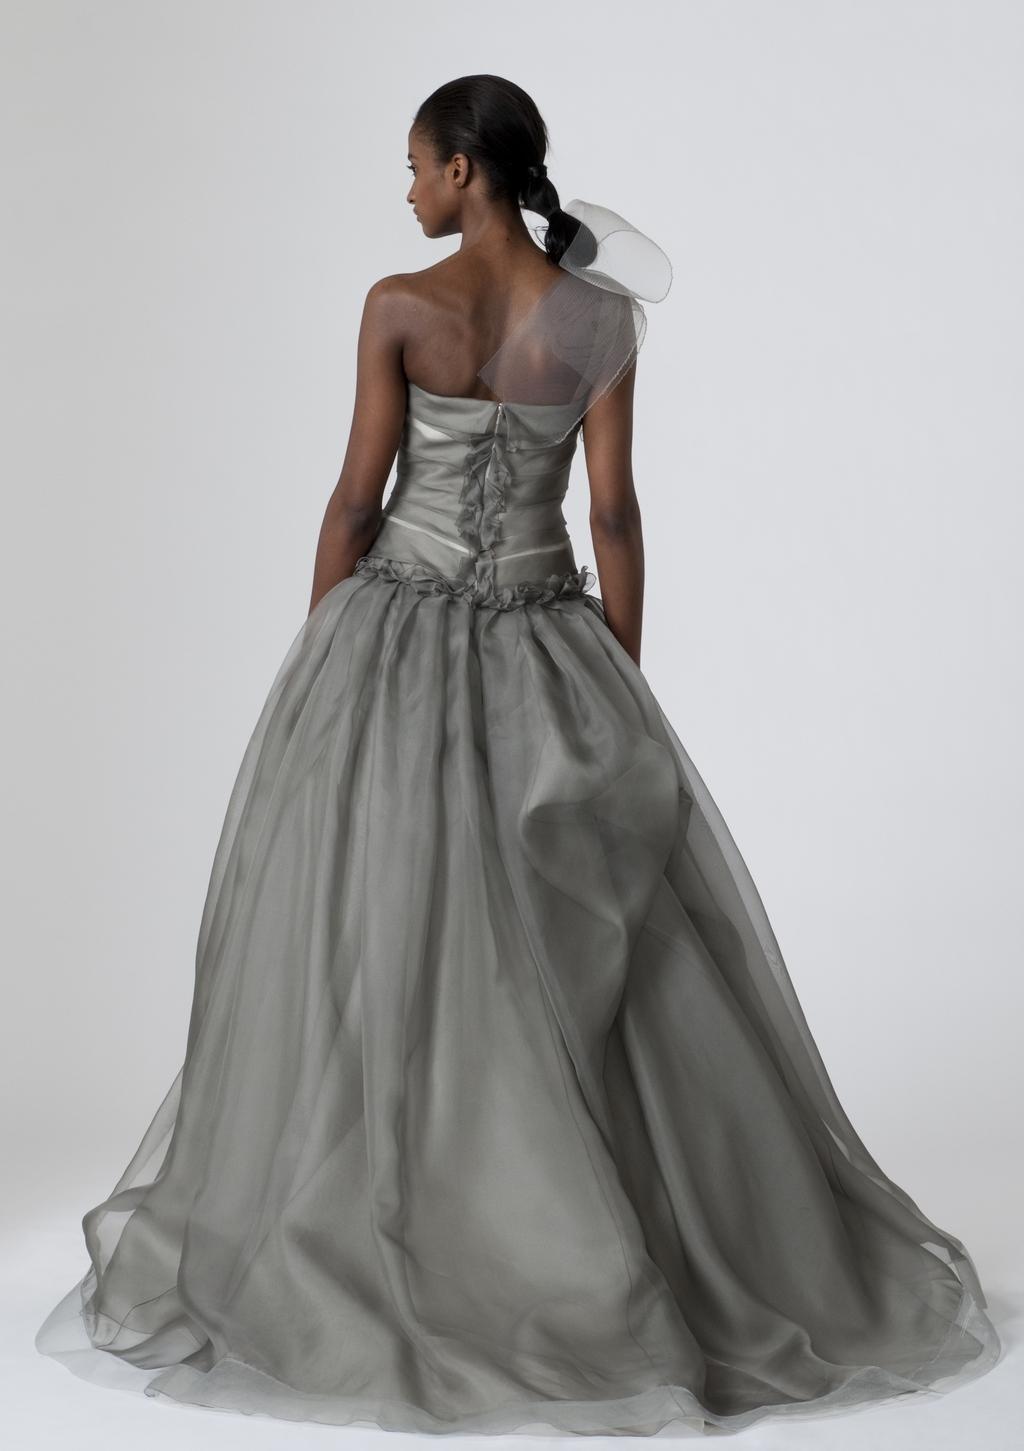 Vera-wang-wedding-dresses-spring-2010-10-back.full